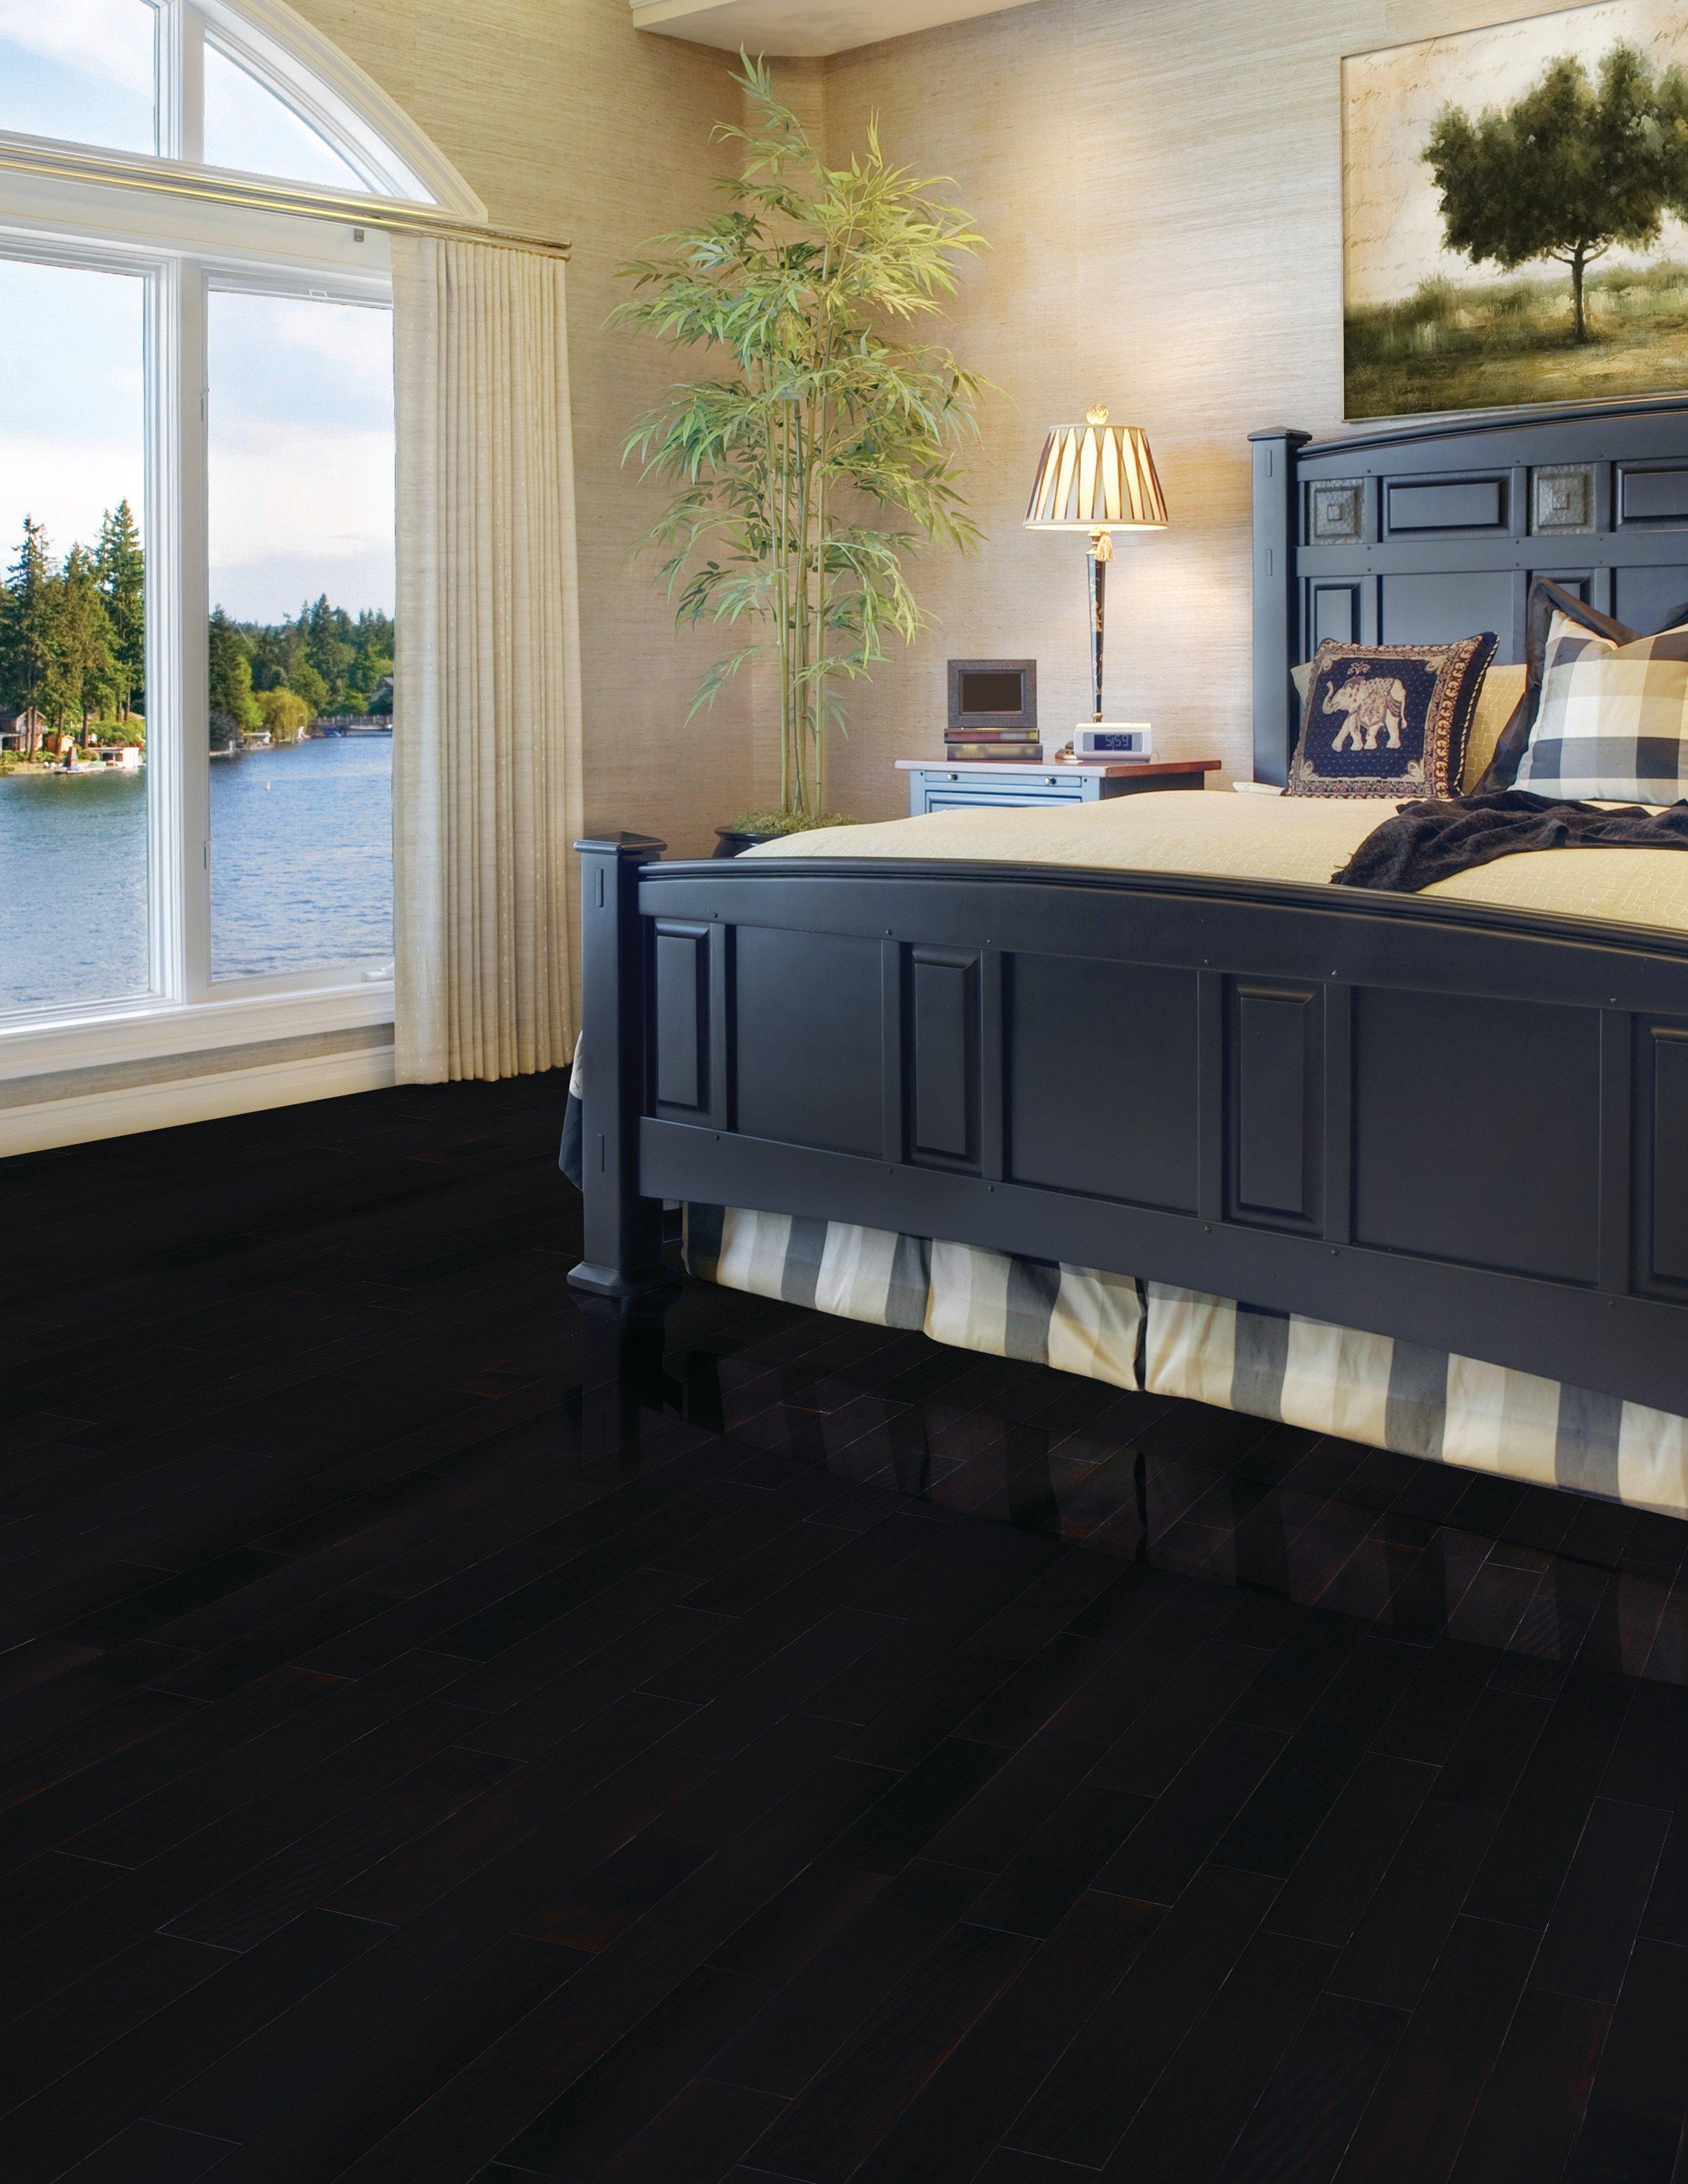 Pacific Nakaza Taun Smooth Engineered Hardwood   9/16in. X 4 3/4in.    941600429 | Floor And Decor